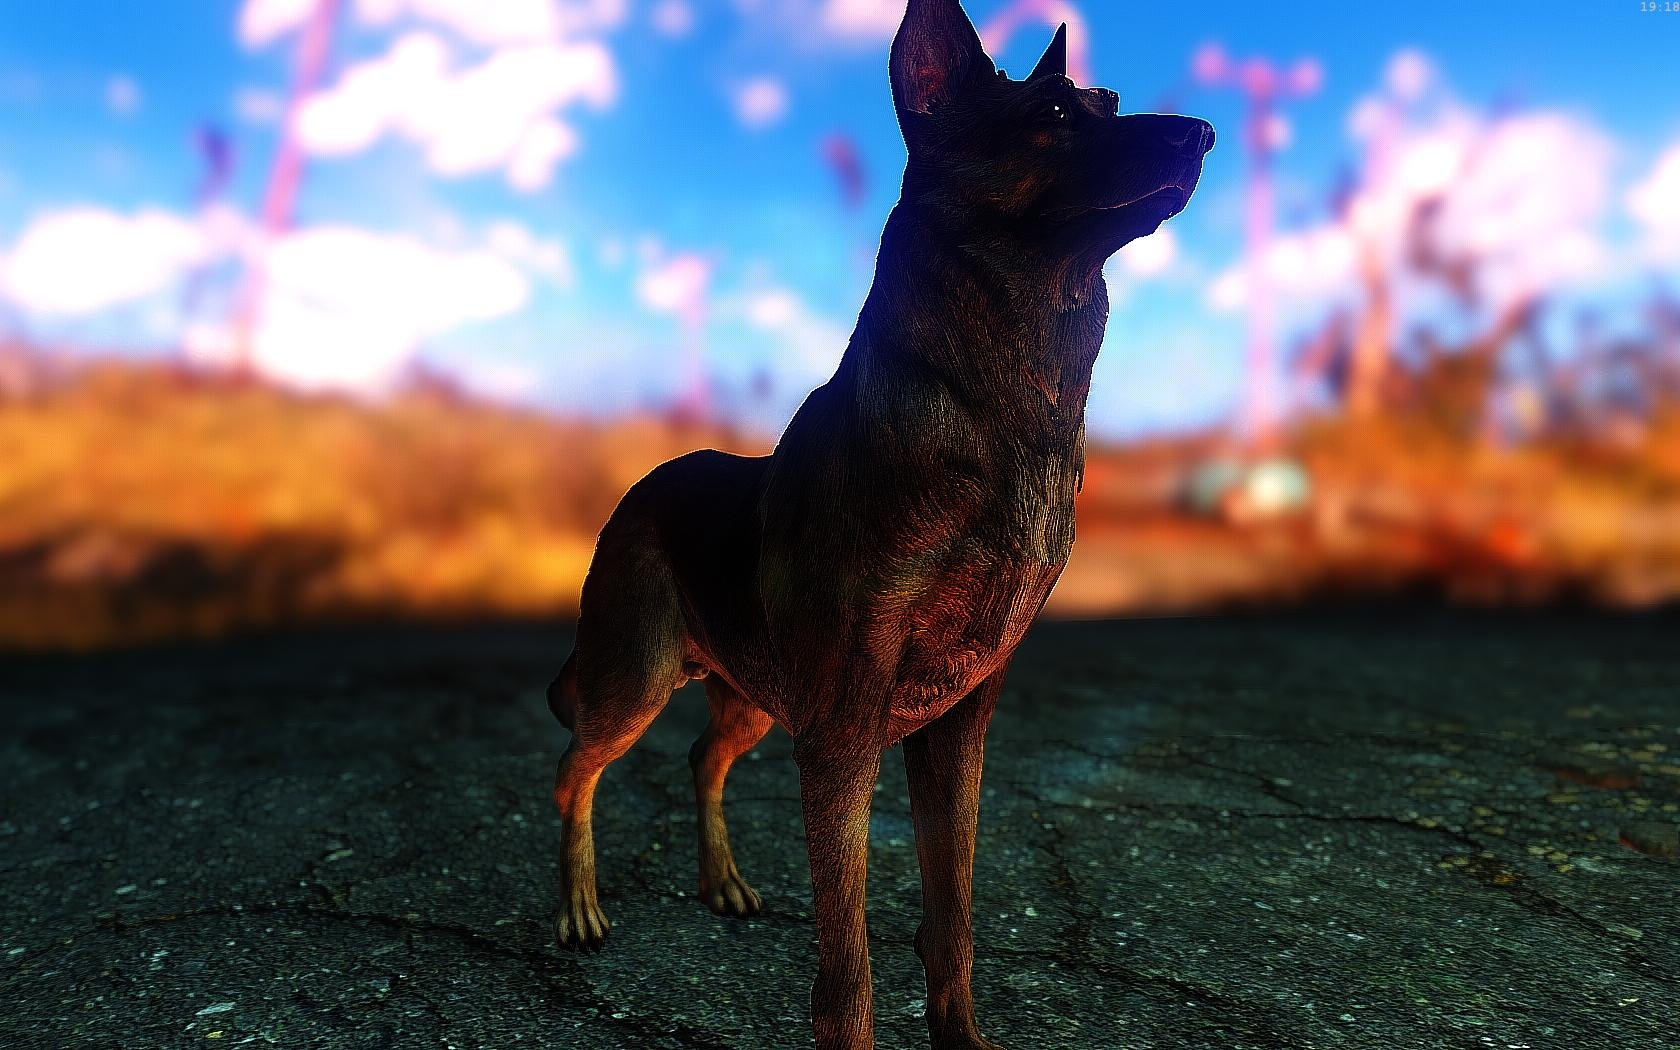 Fallout4 2019-01-15 19-18-55-66